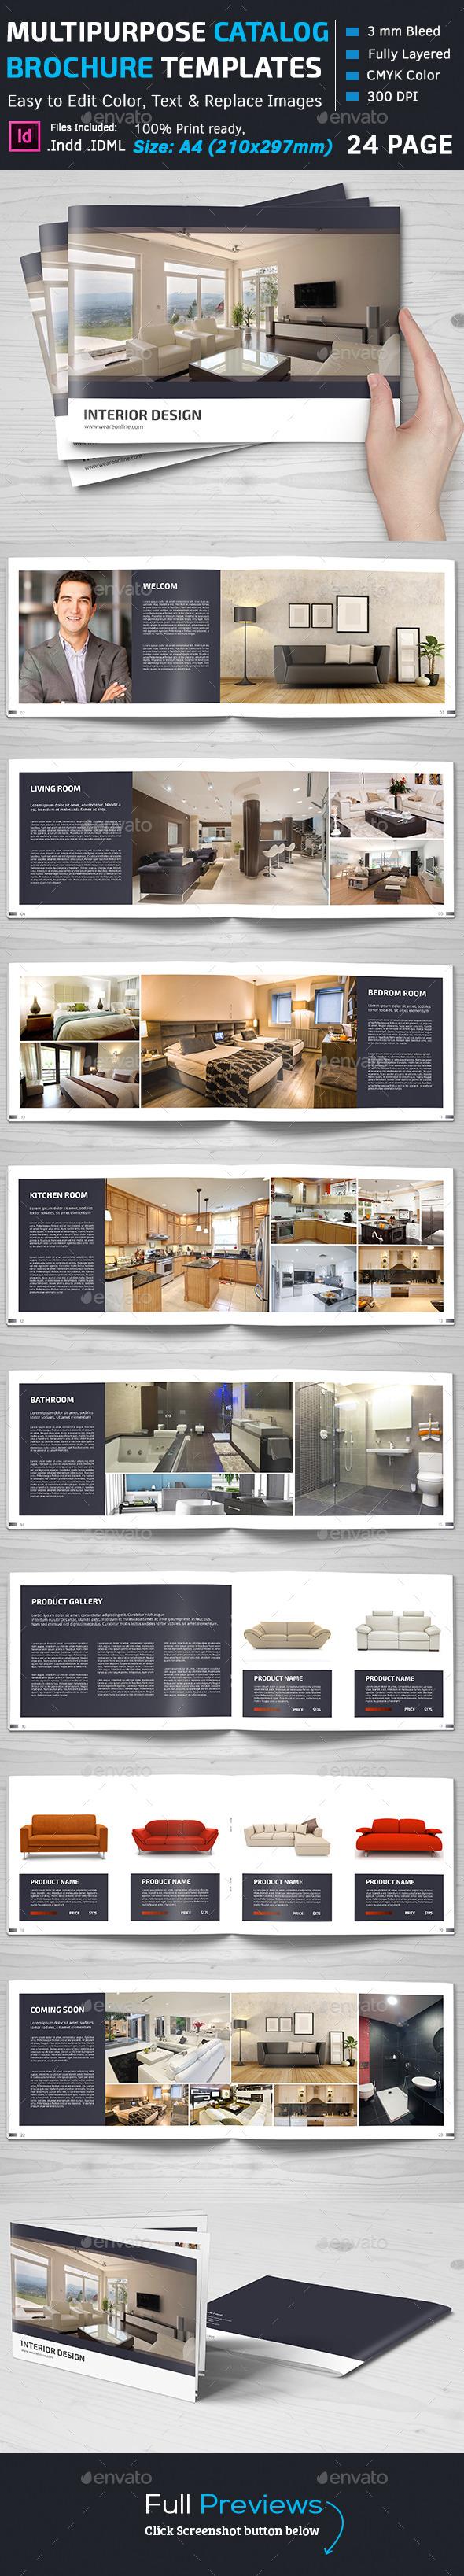 GraphicRiver Multipurpose Catalog 11280866